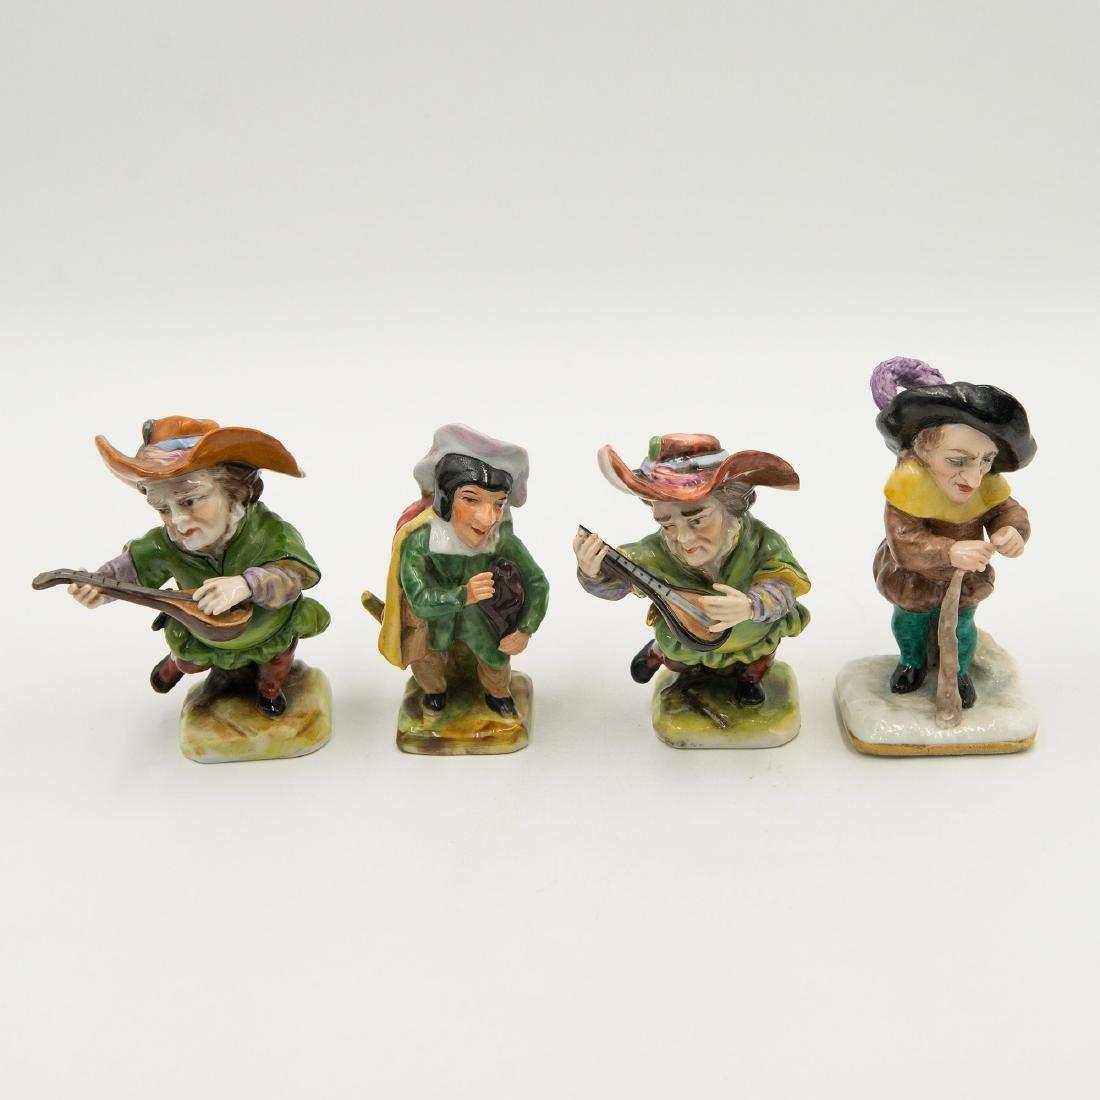 Capodimonte Porcelain Group of 4 Gnomes Dwarfs